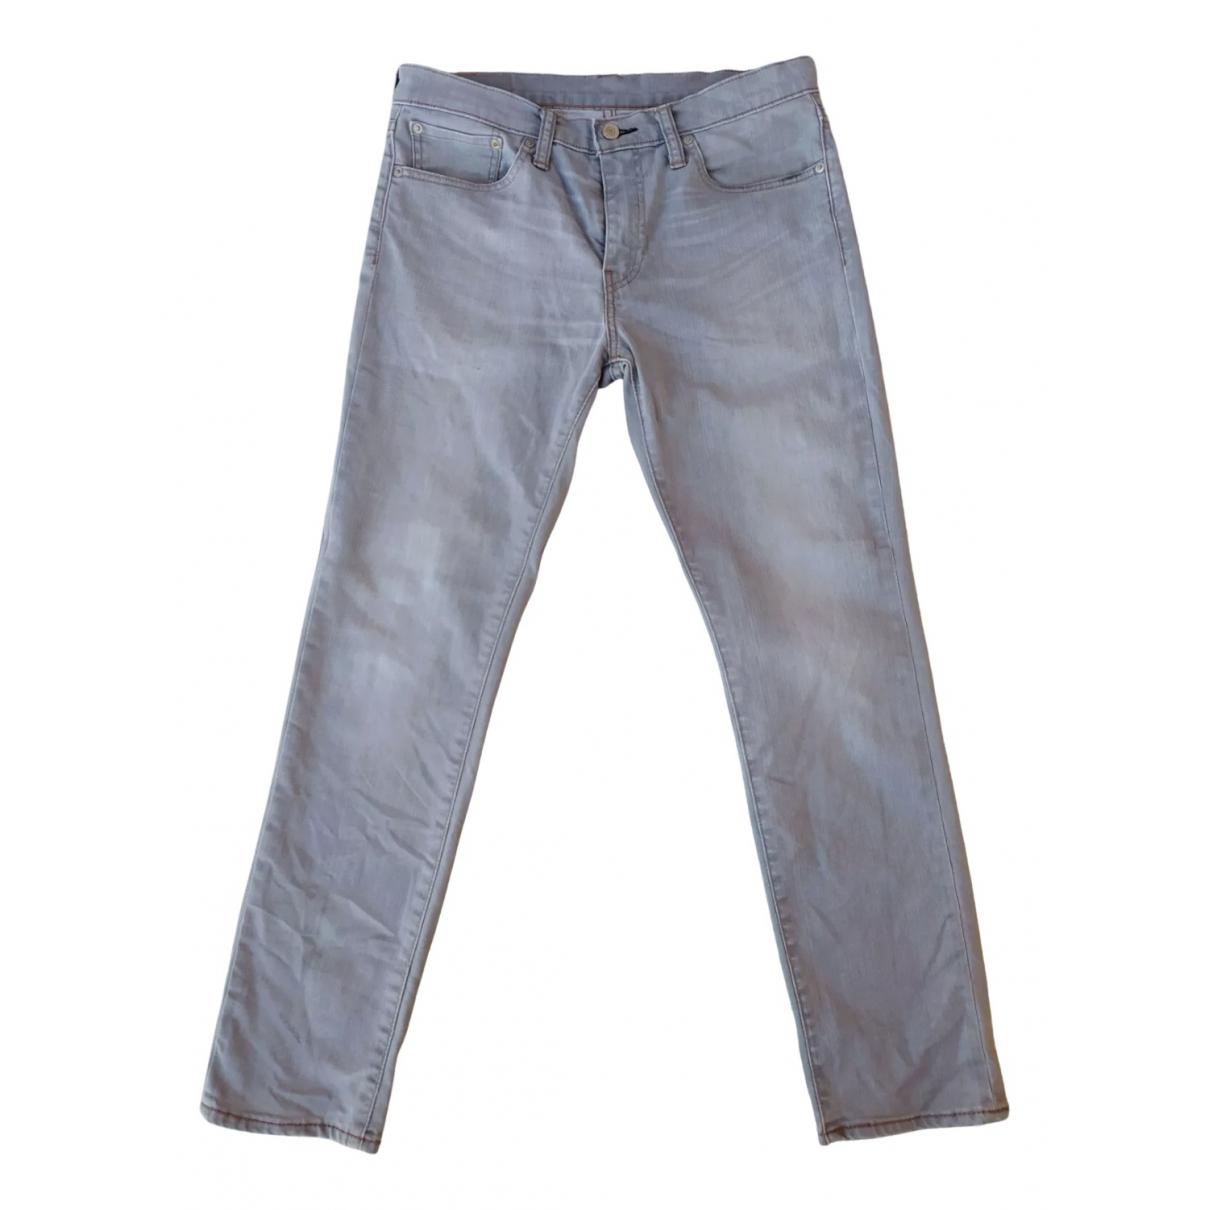 Levi's N Grey Denim - Jeans Jeans for Women 32 US